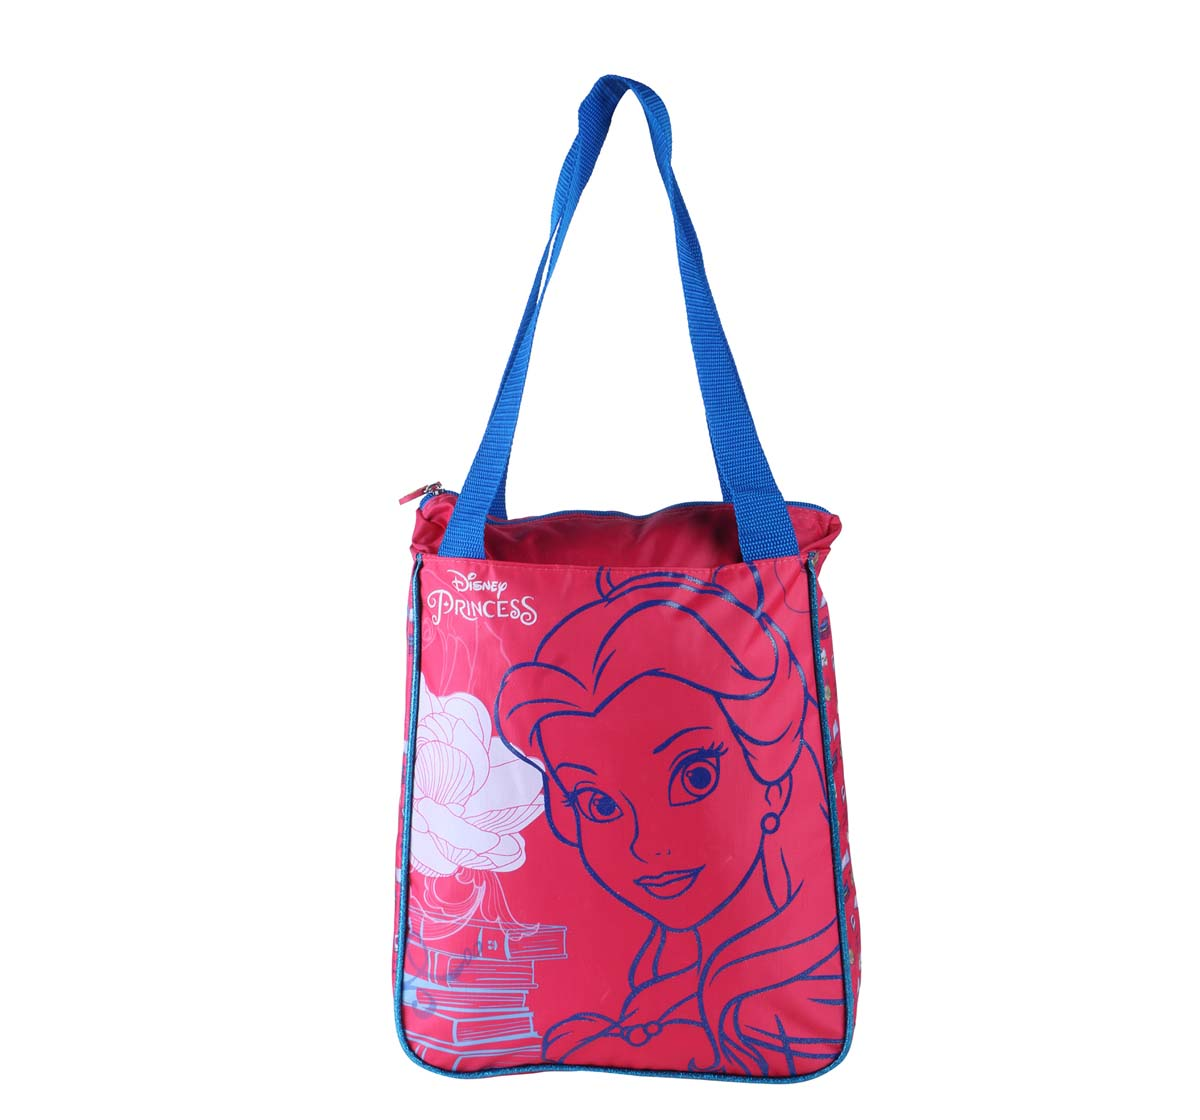 Disney | Disney Princess - Light Pink Handbags for Girls age 3Y+